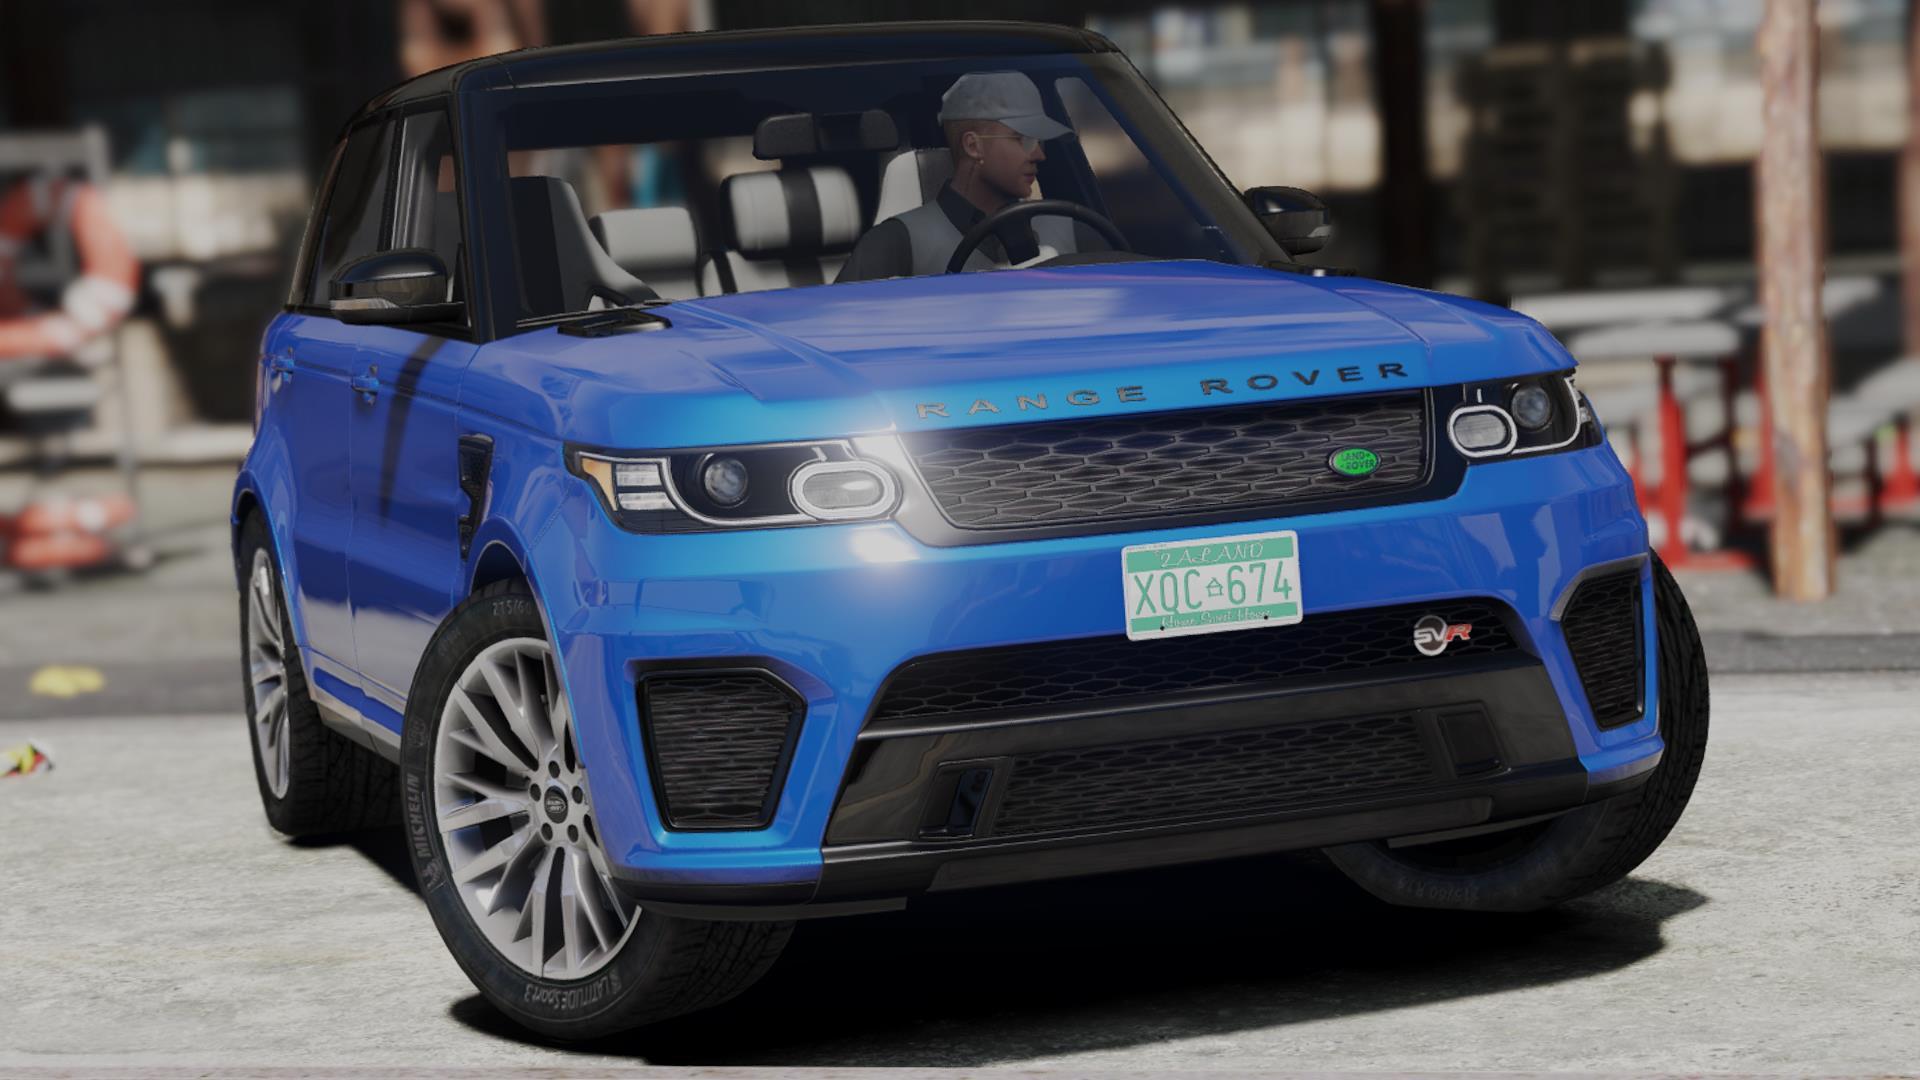 2014 Range Rover Sport SVR 5 0 V8 [Add on Replace] GTA5 Mods